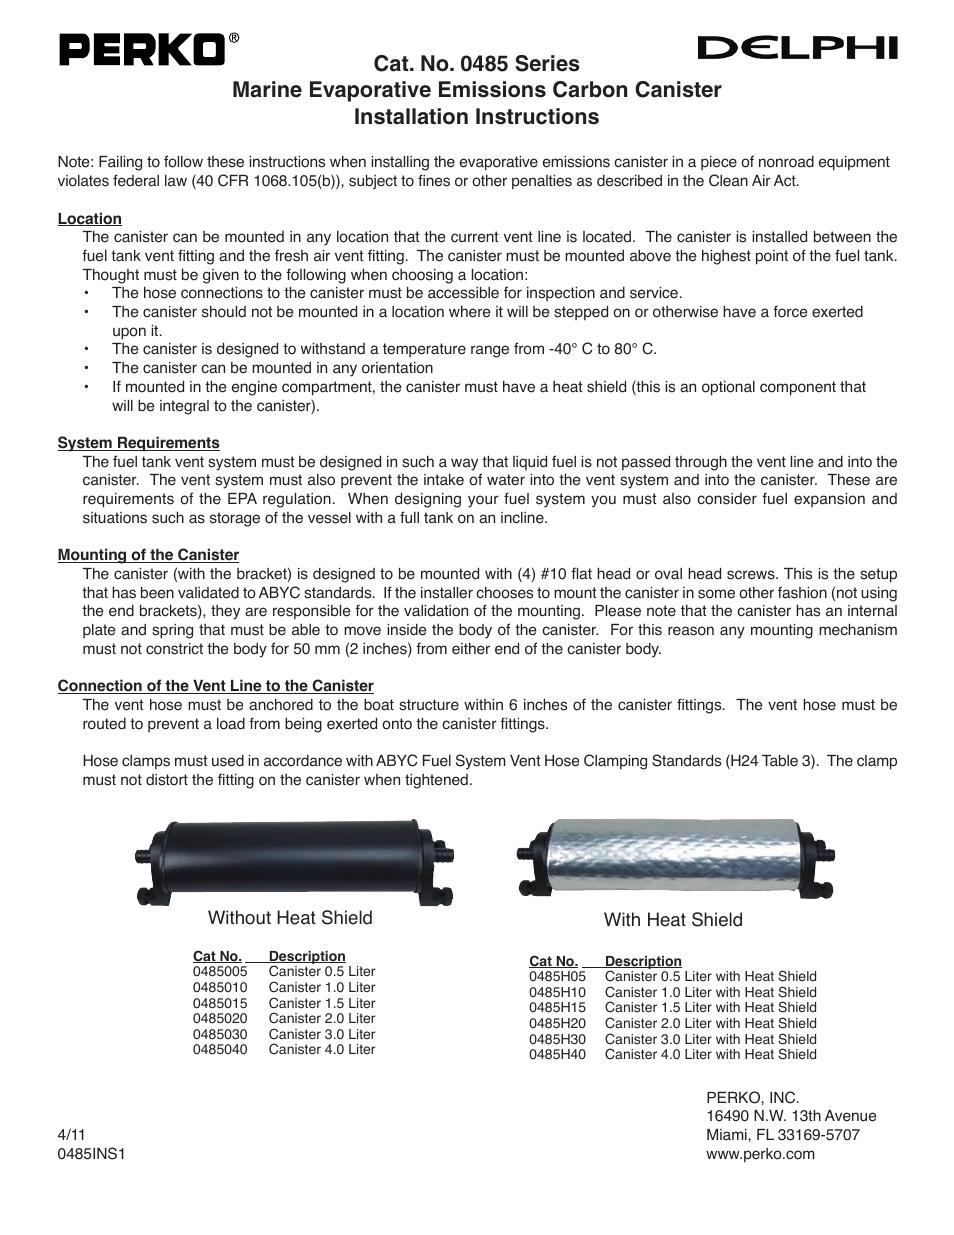 PERKO 0485 User Manual | 1 page